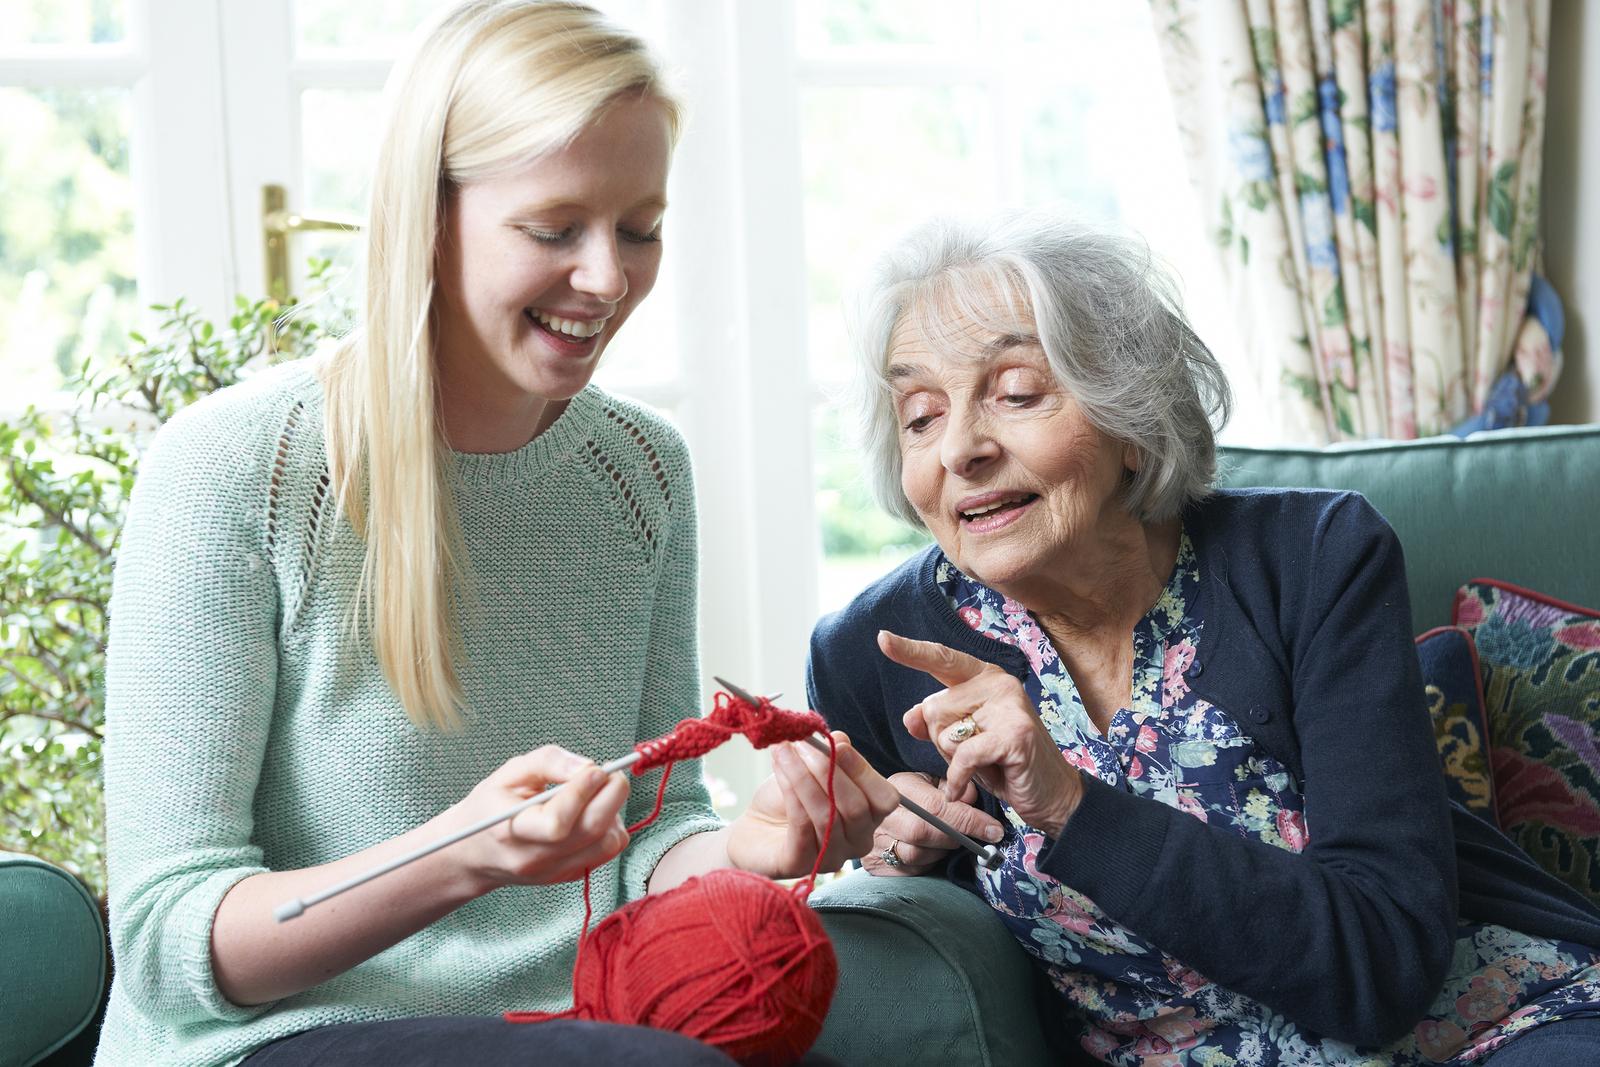 bigstock-Grandmother-Showing-Granddaugh-80302241.jpg